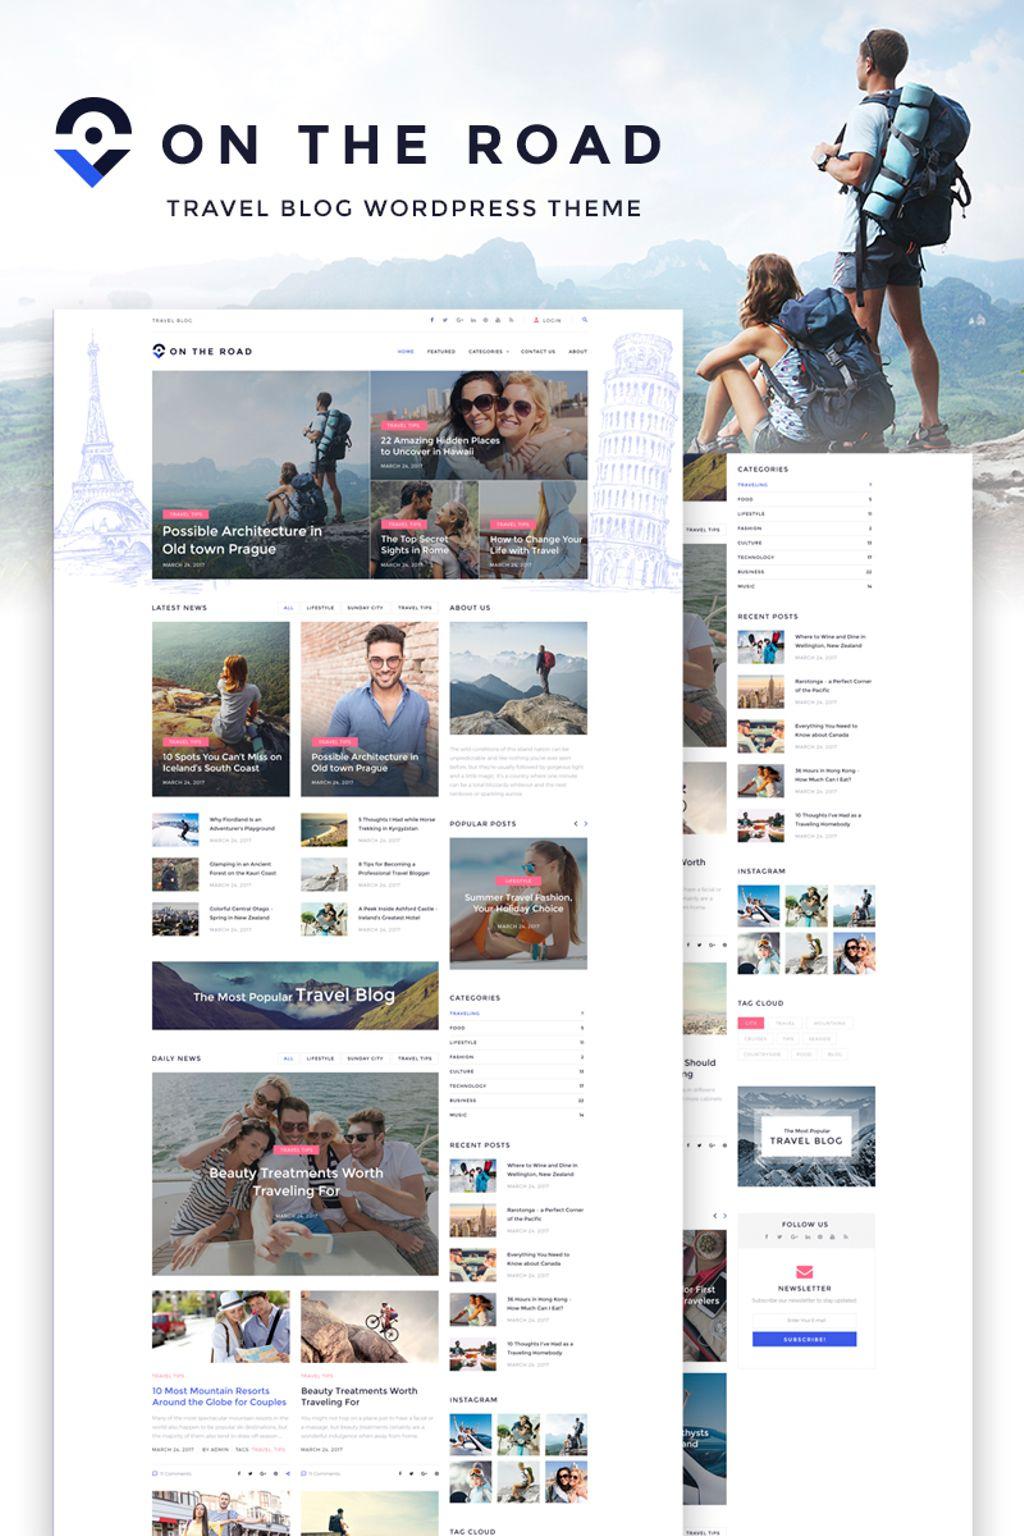 On The Road - Travel Blog WordPress Theme - screenshot